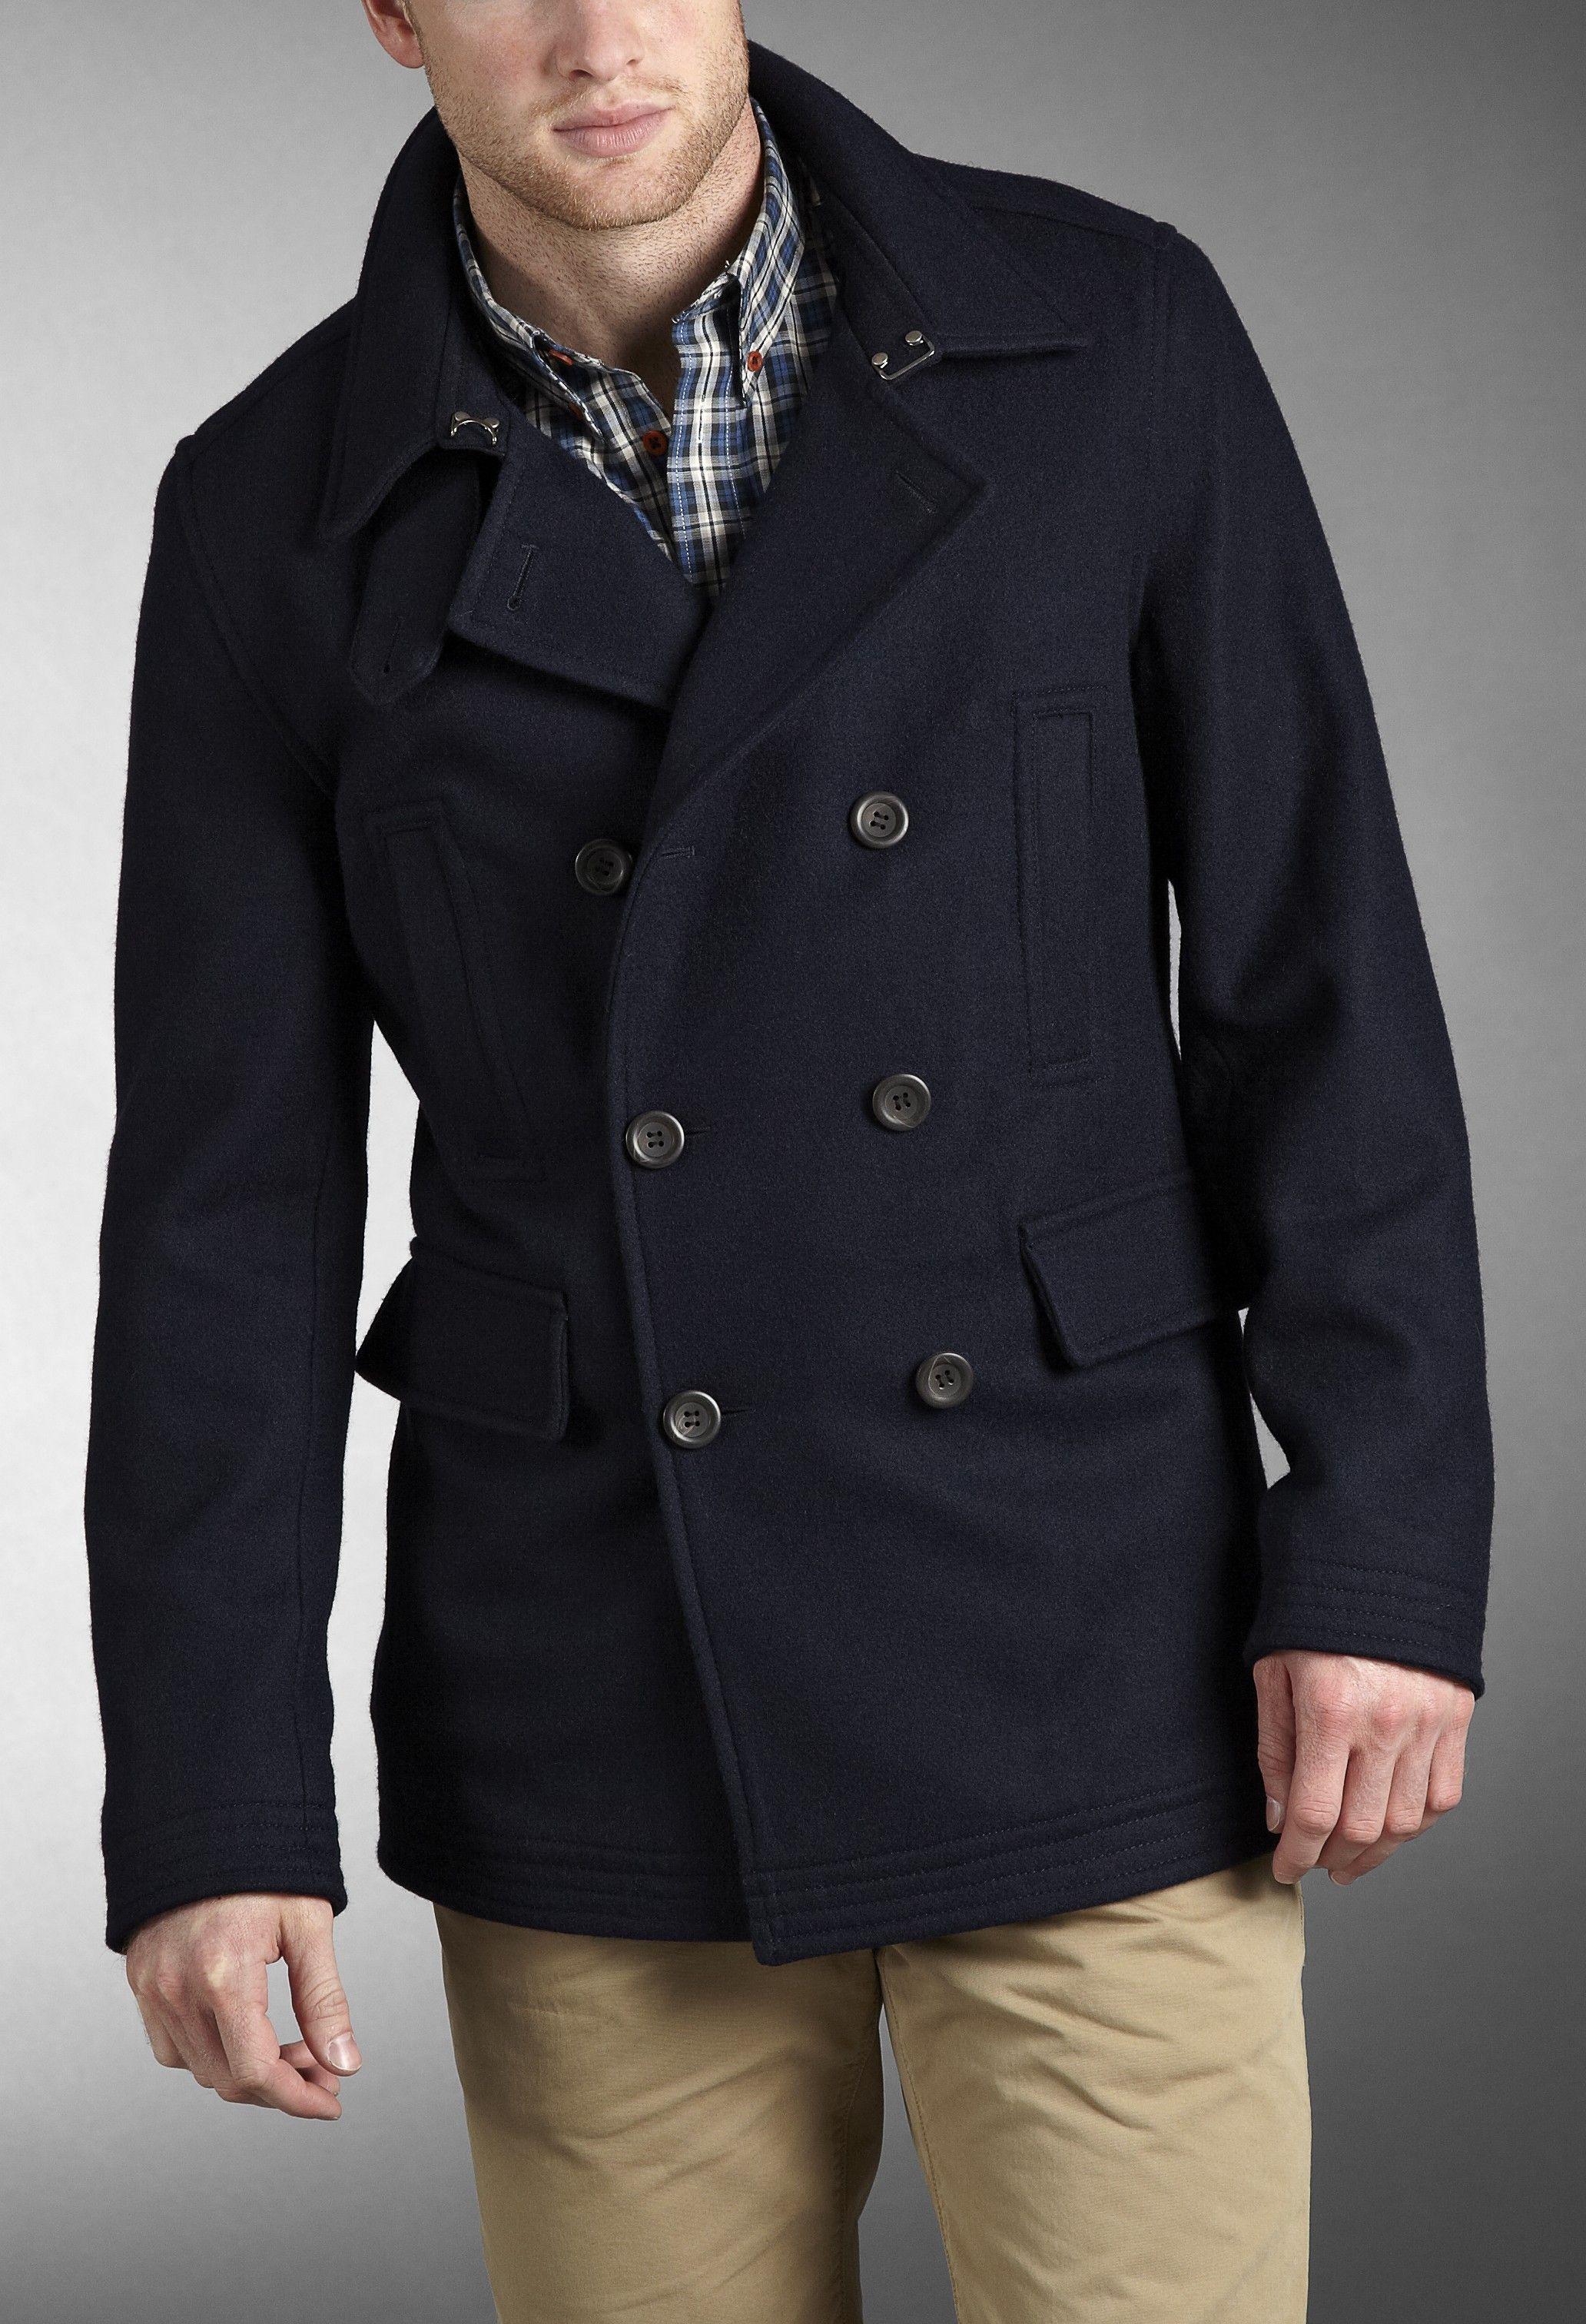 f883b20f7d10 Ben Sherman Plectrum - Classic Peacoat. Ben Sherman Plectrum - Classic Peacoat  Navy Pea Coat ...